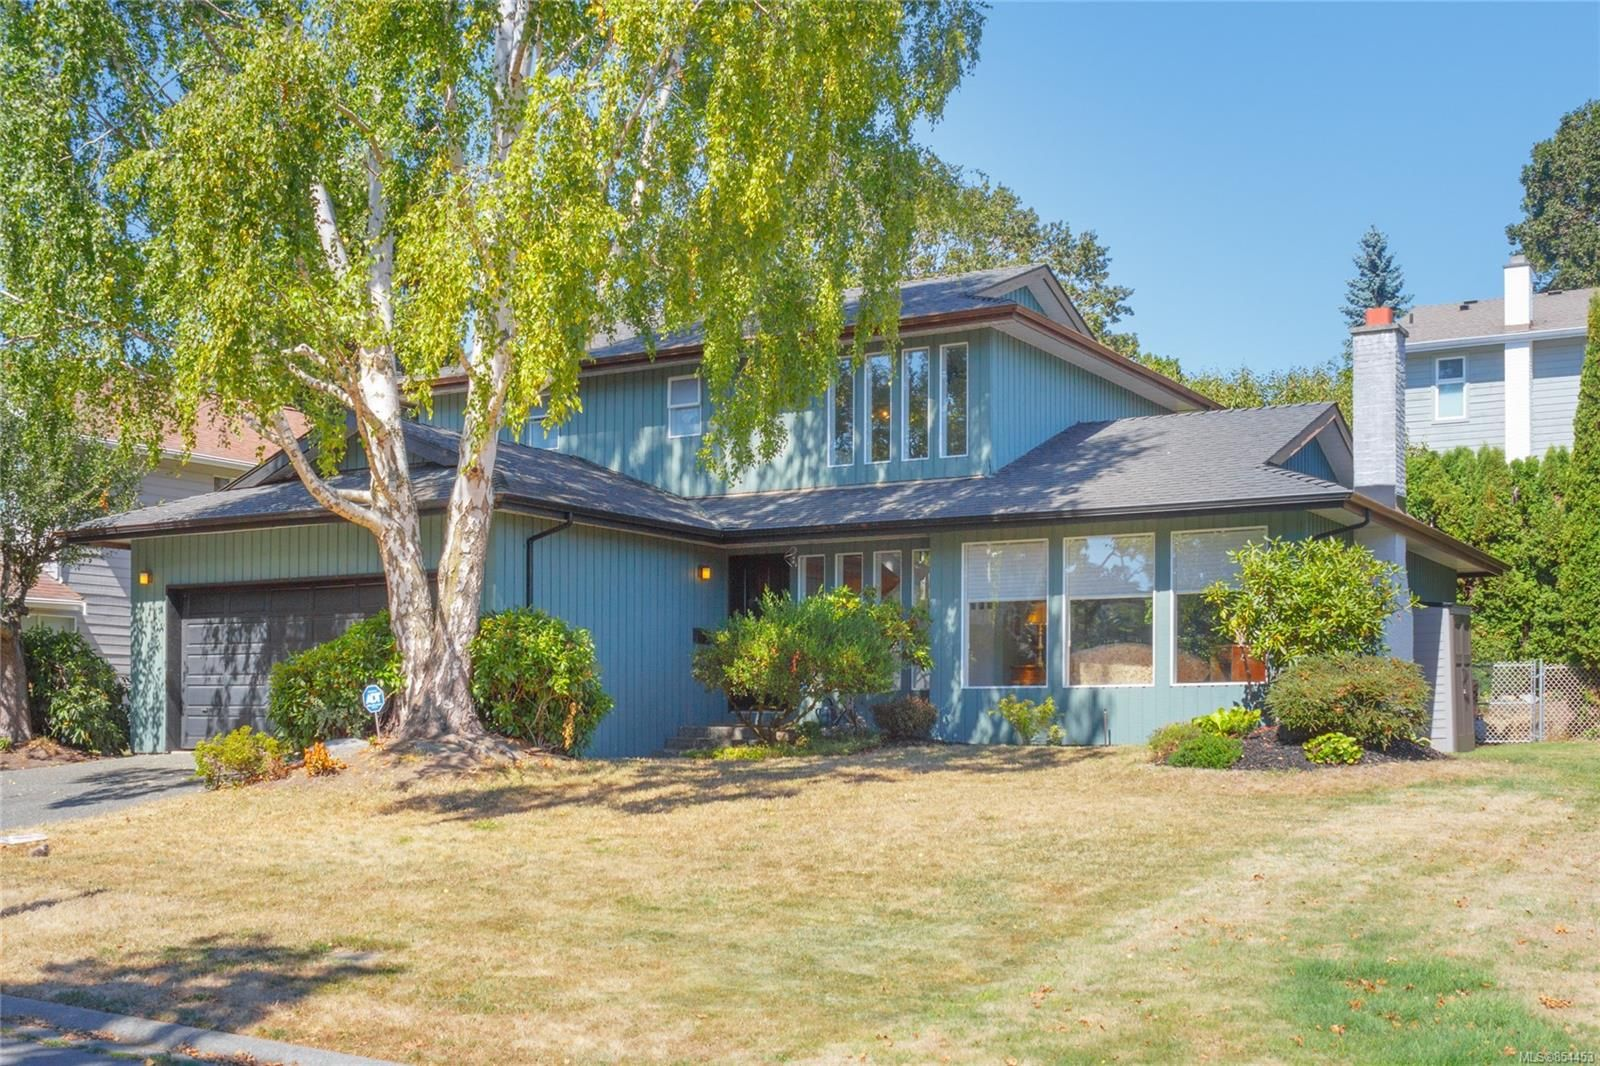 Main Photo: 1532 Palahi Pl in : SE Mt Doug House for sale (Saanich East)  : MLS®# 854453